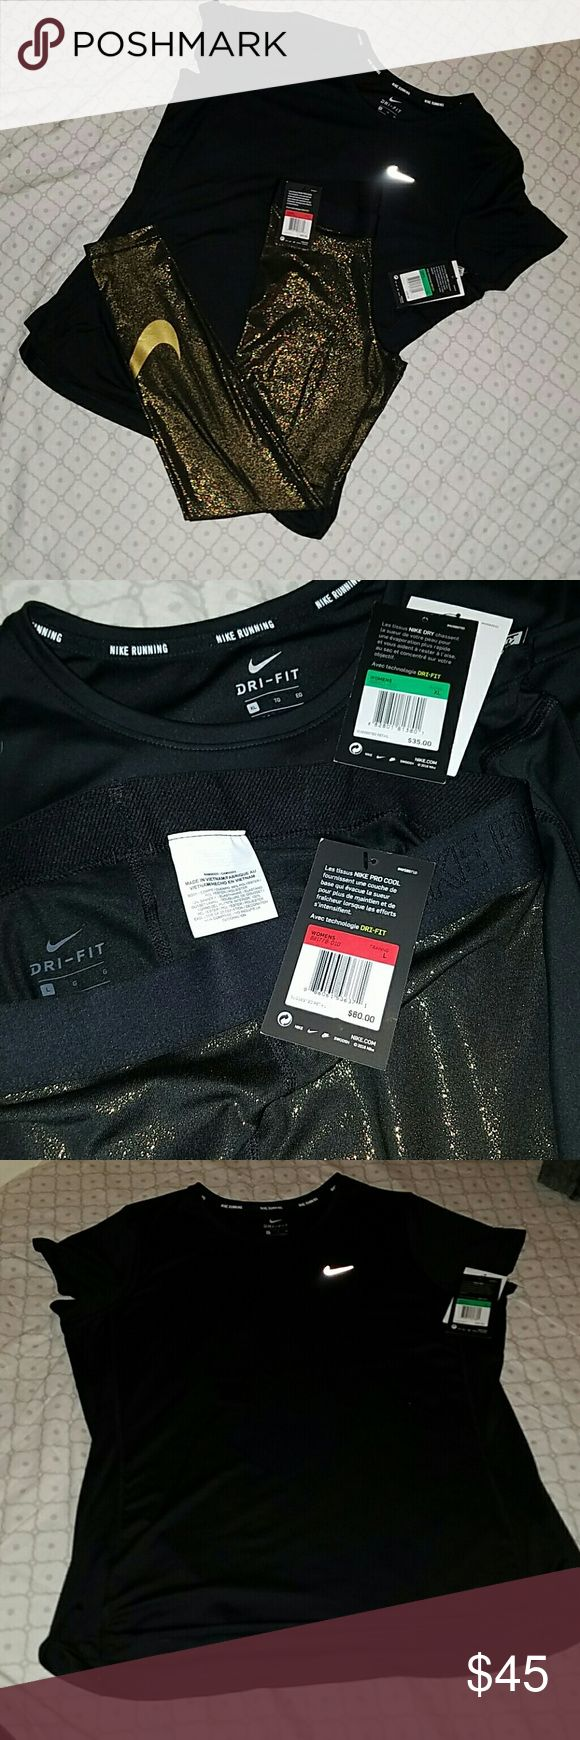 NWT Nike leggings and NWT Nike T-Shirt Nike gold shimmered leggings and Nike t-shirt Nike Pants Leggings